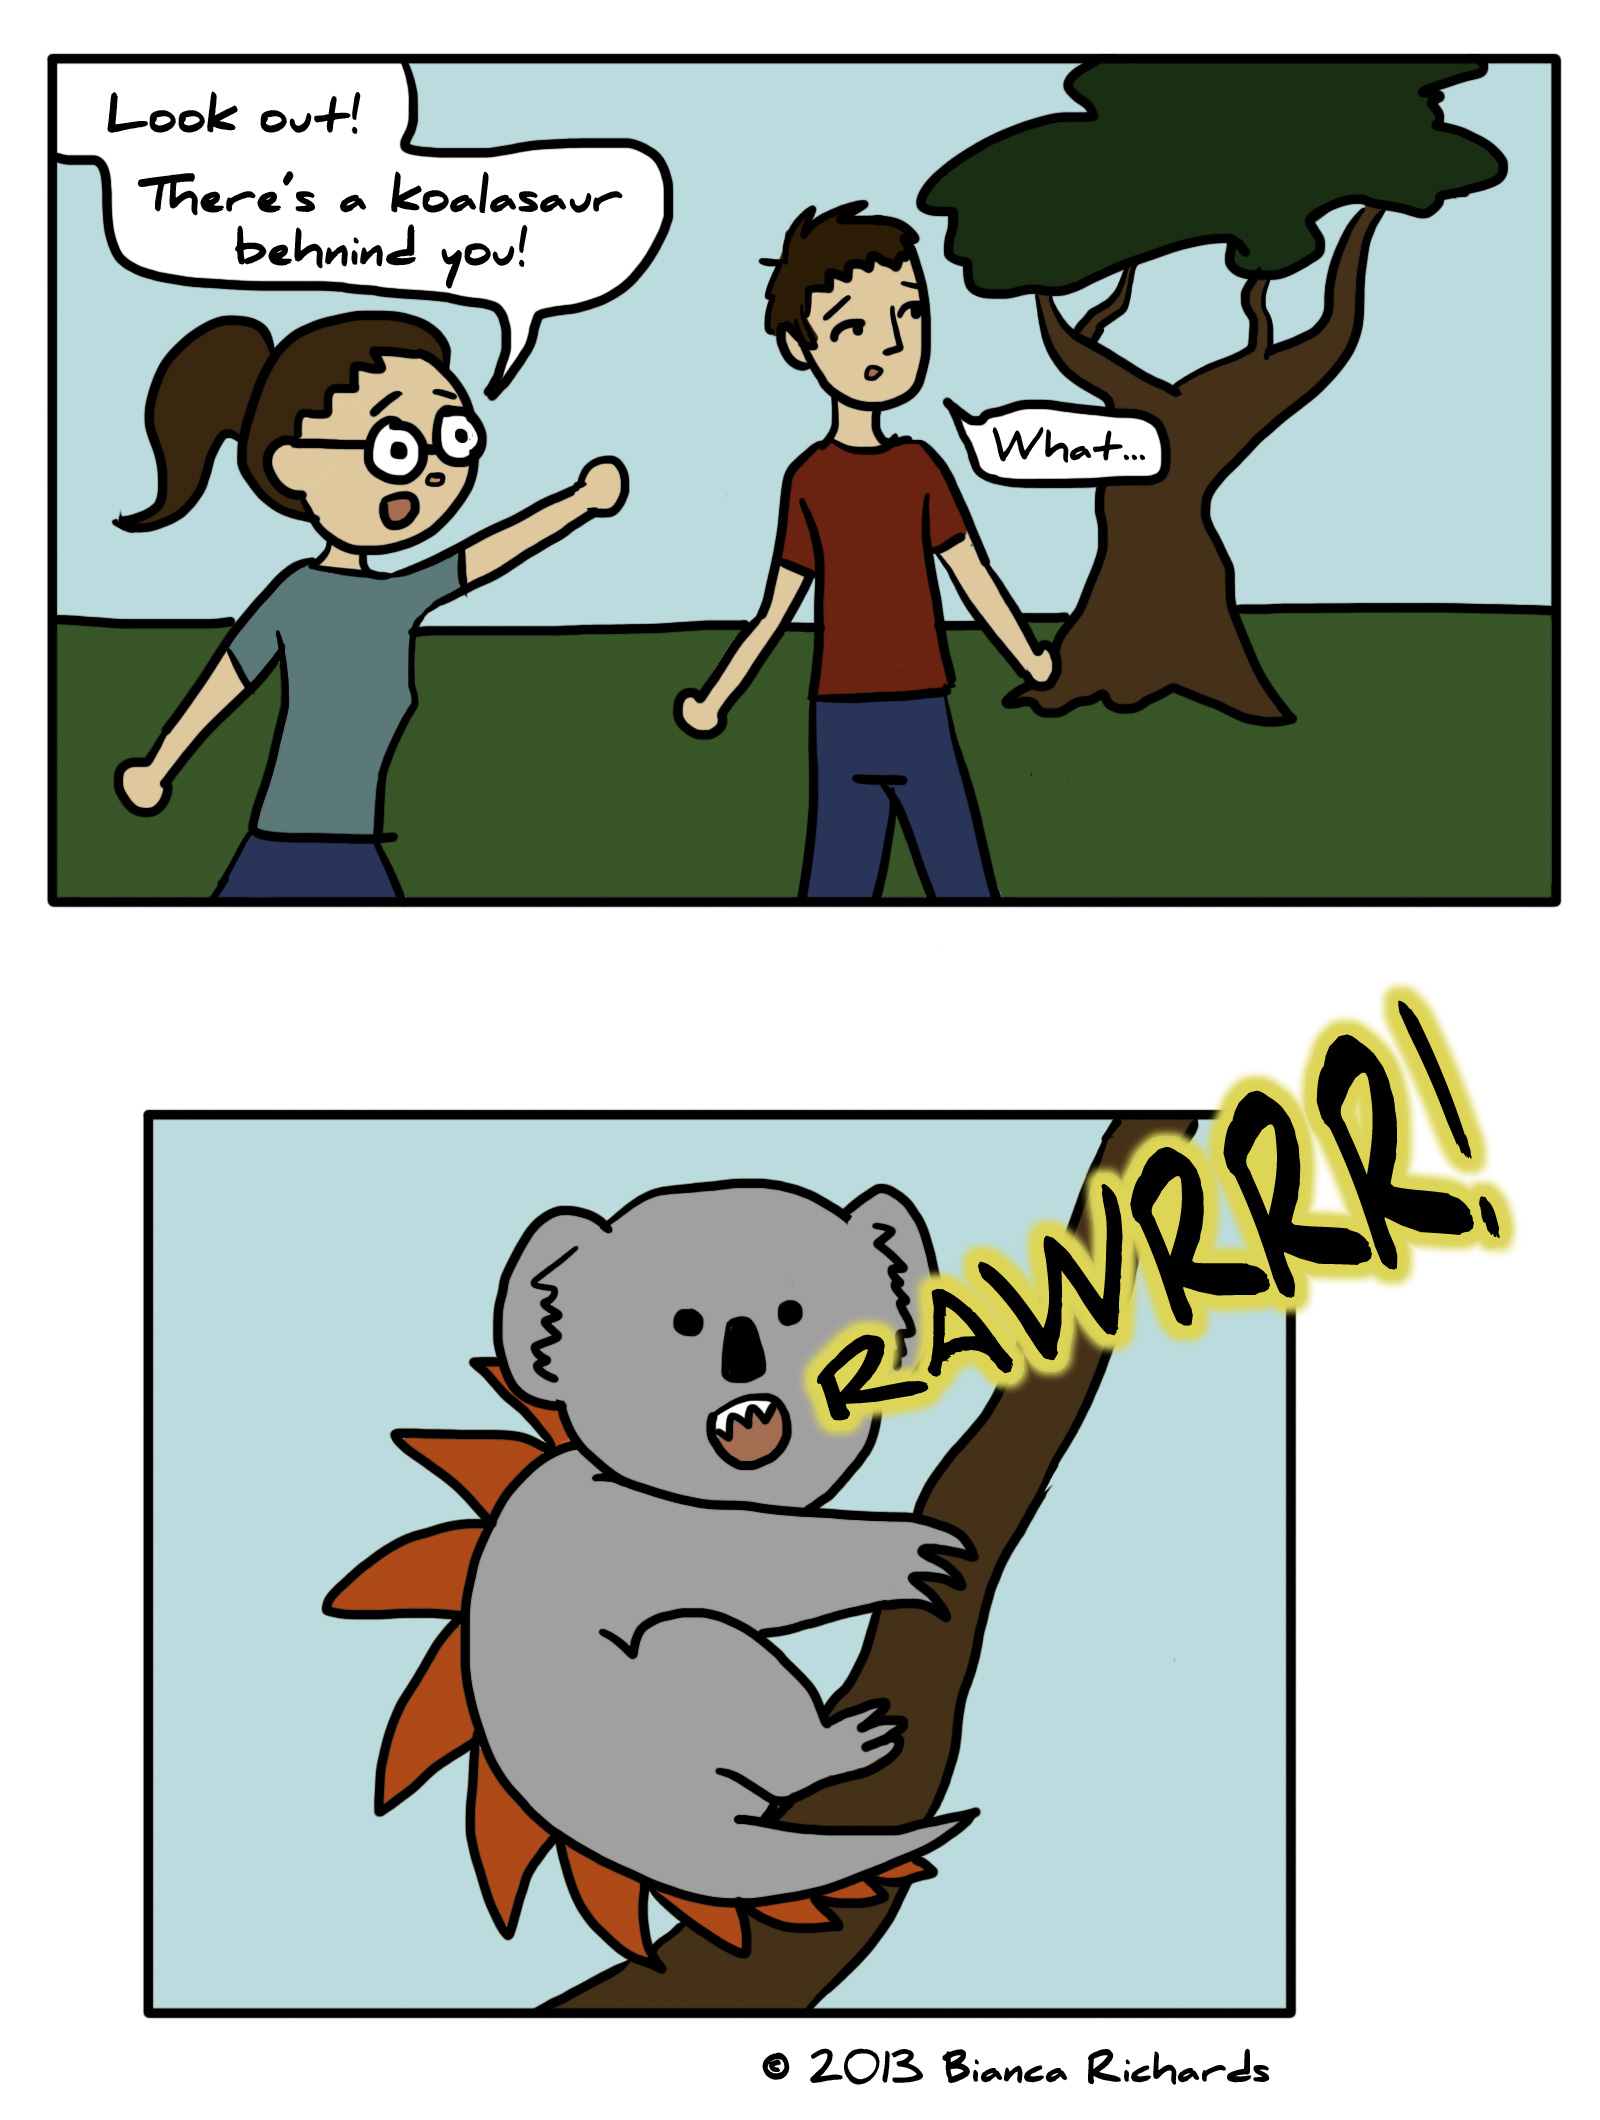 Koalasaur!